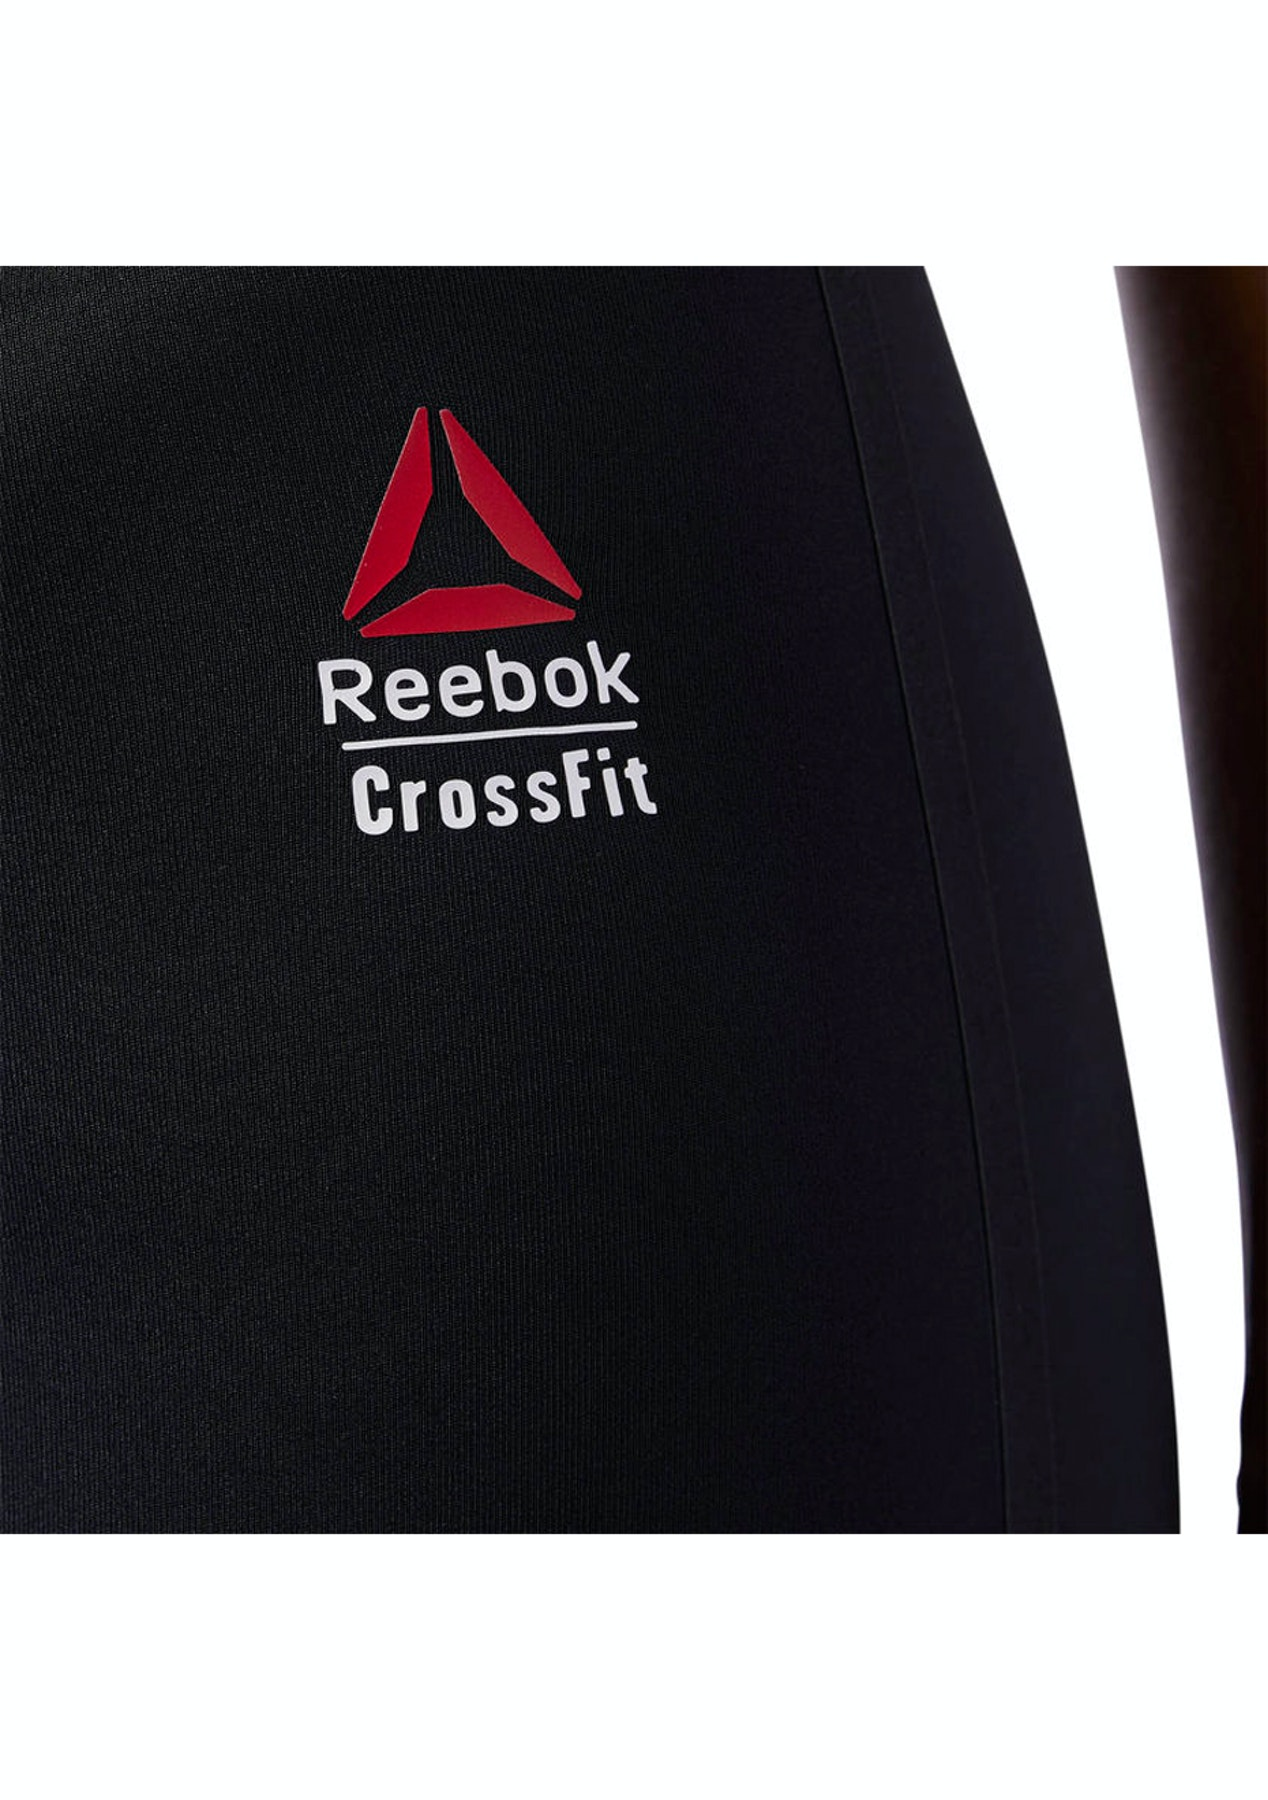 e6728ef07c4426 Reebok Womens - Reebok Crossfit Compression Legging - Black - Our Staff  Picks! - Onceit